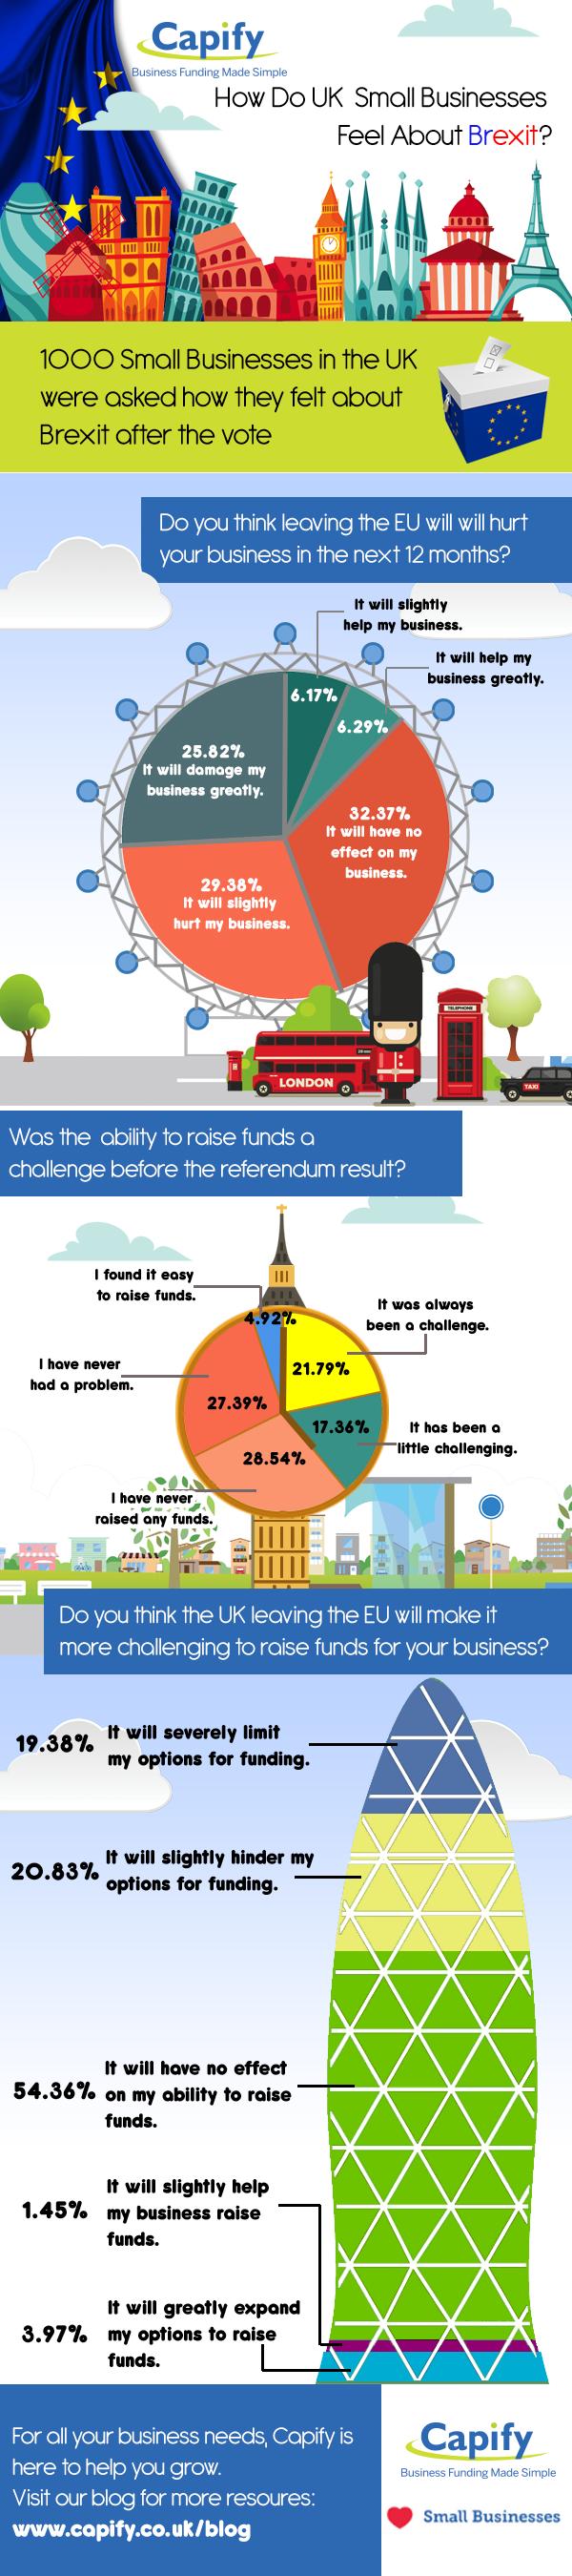 Capify Infographic